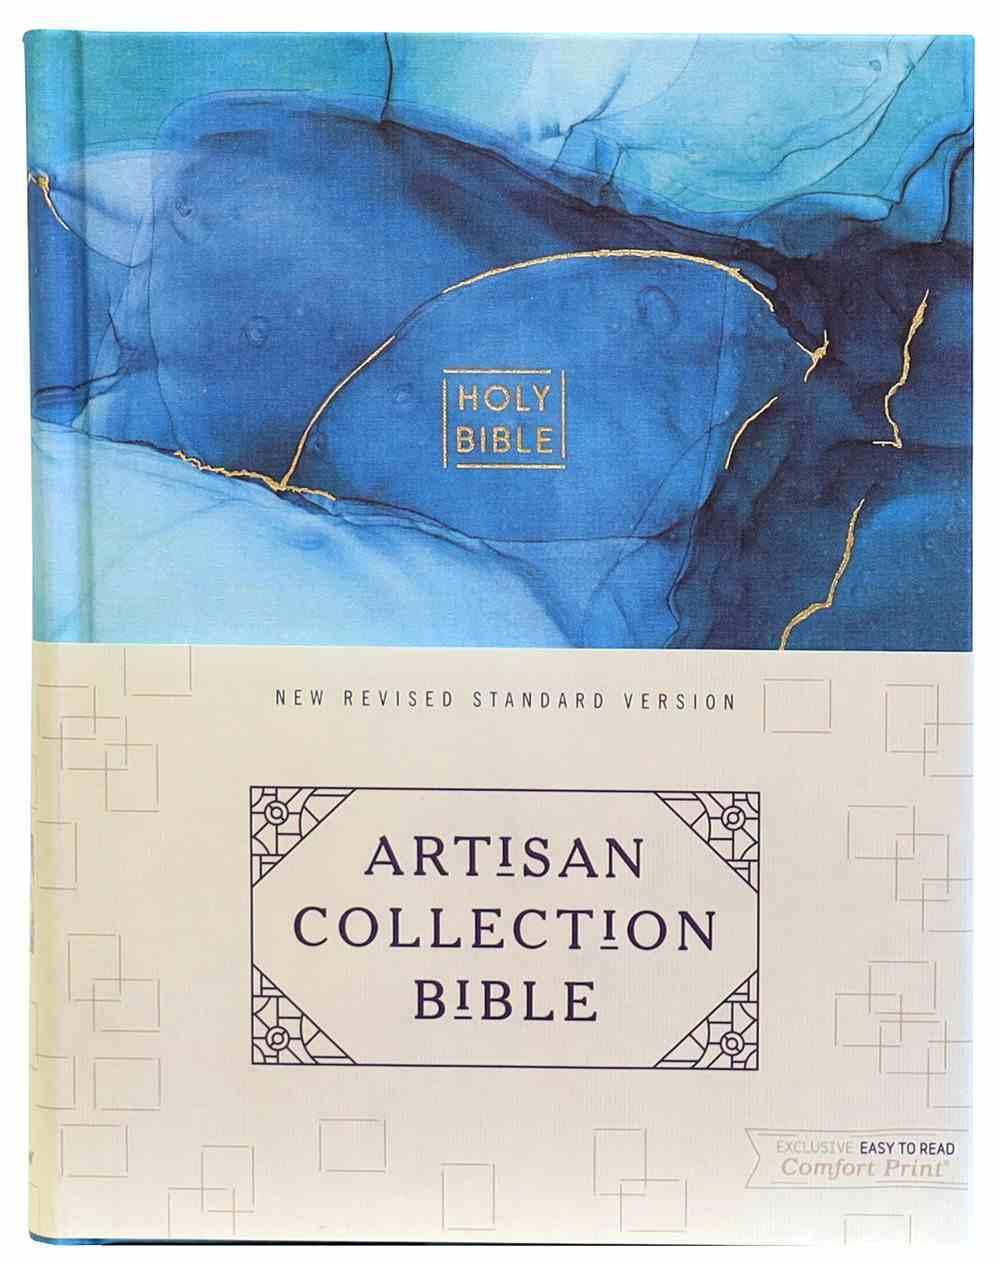 NRSV Artisan Collection Bible Blue Fabric Over Hardback